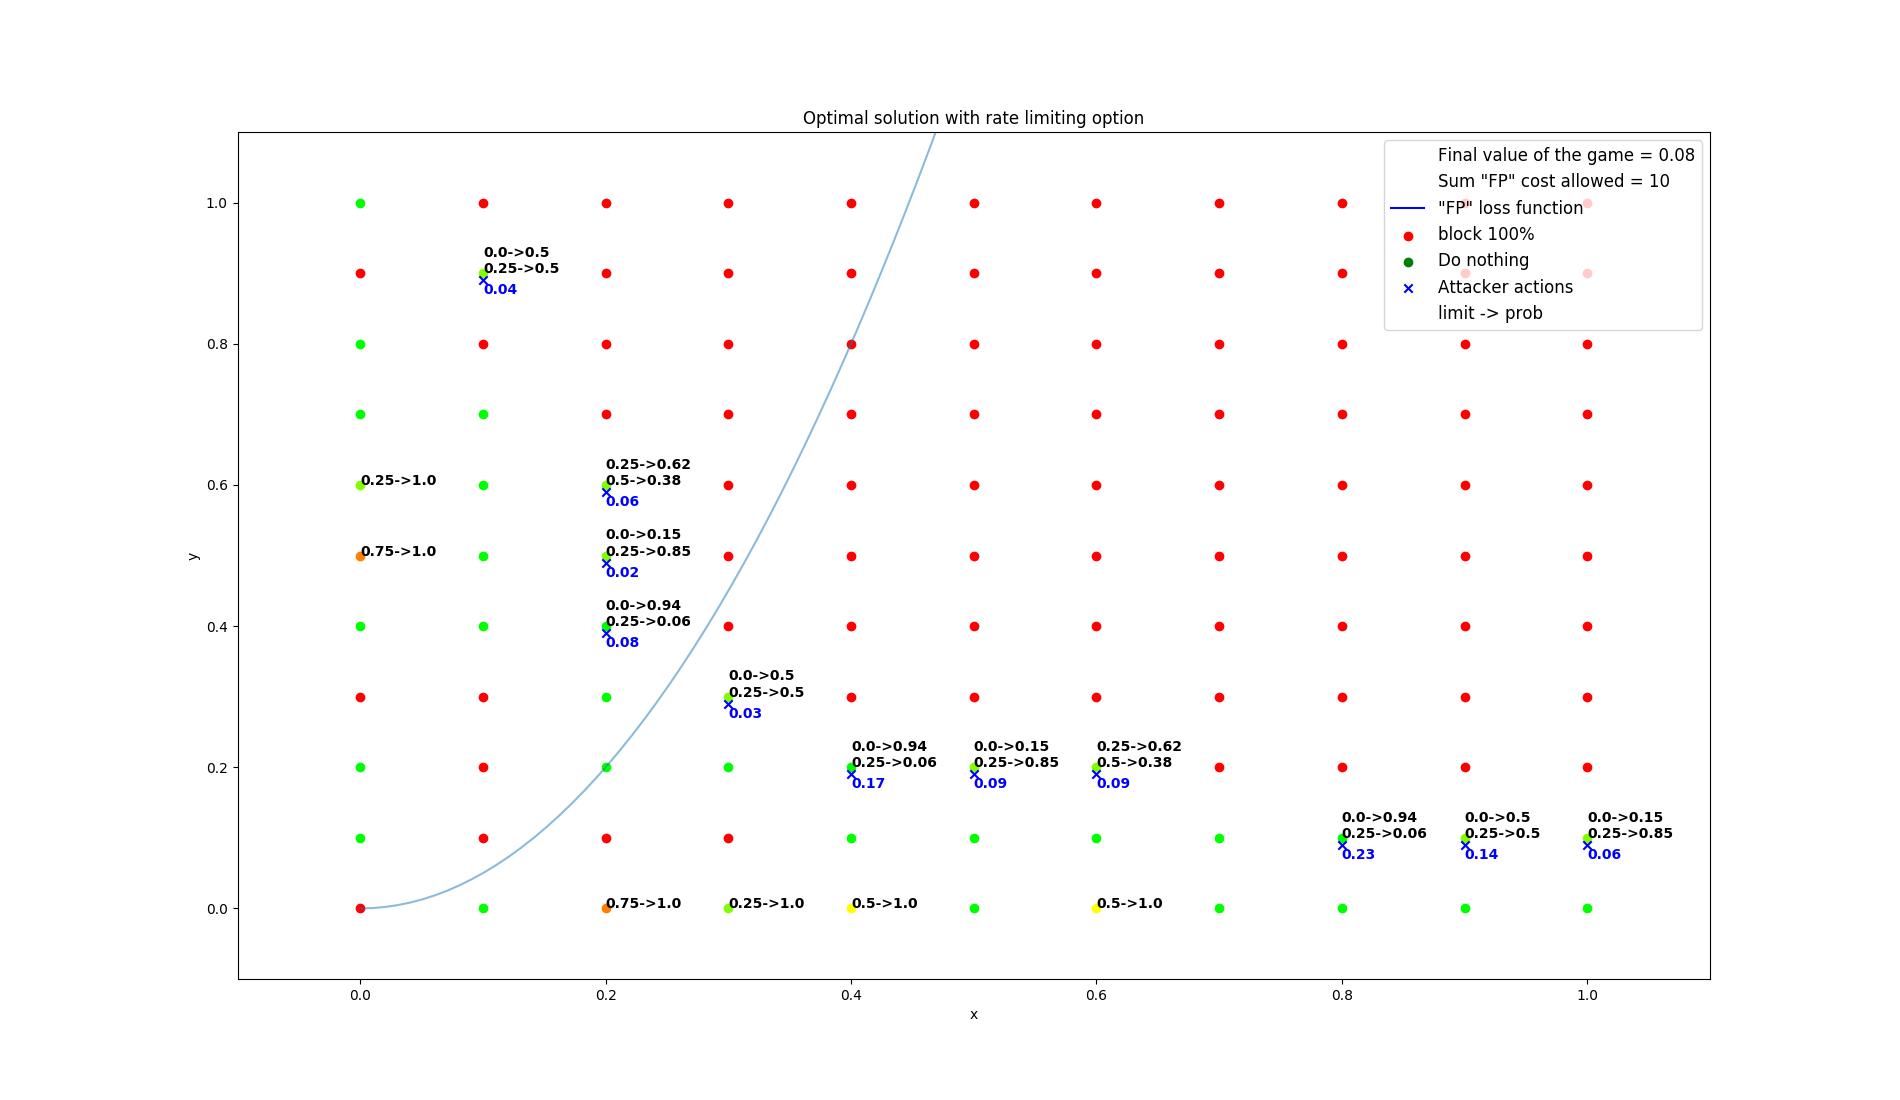 results/optimal/false_positive_constraint/24-summarization.png